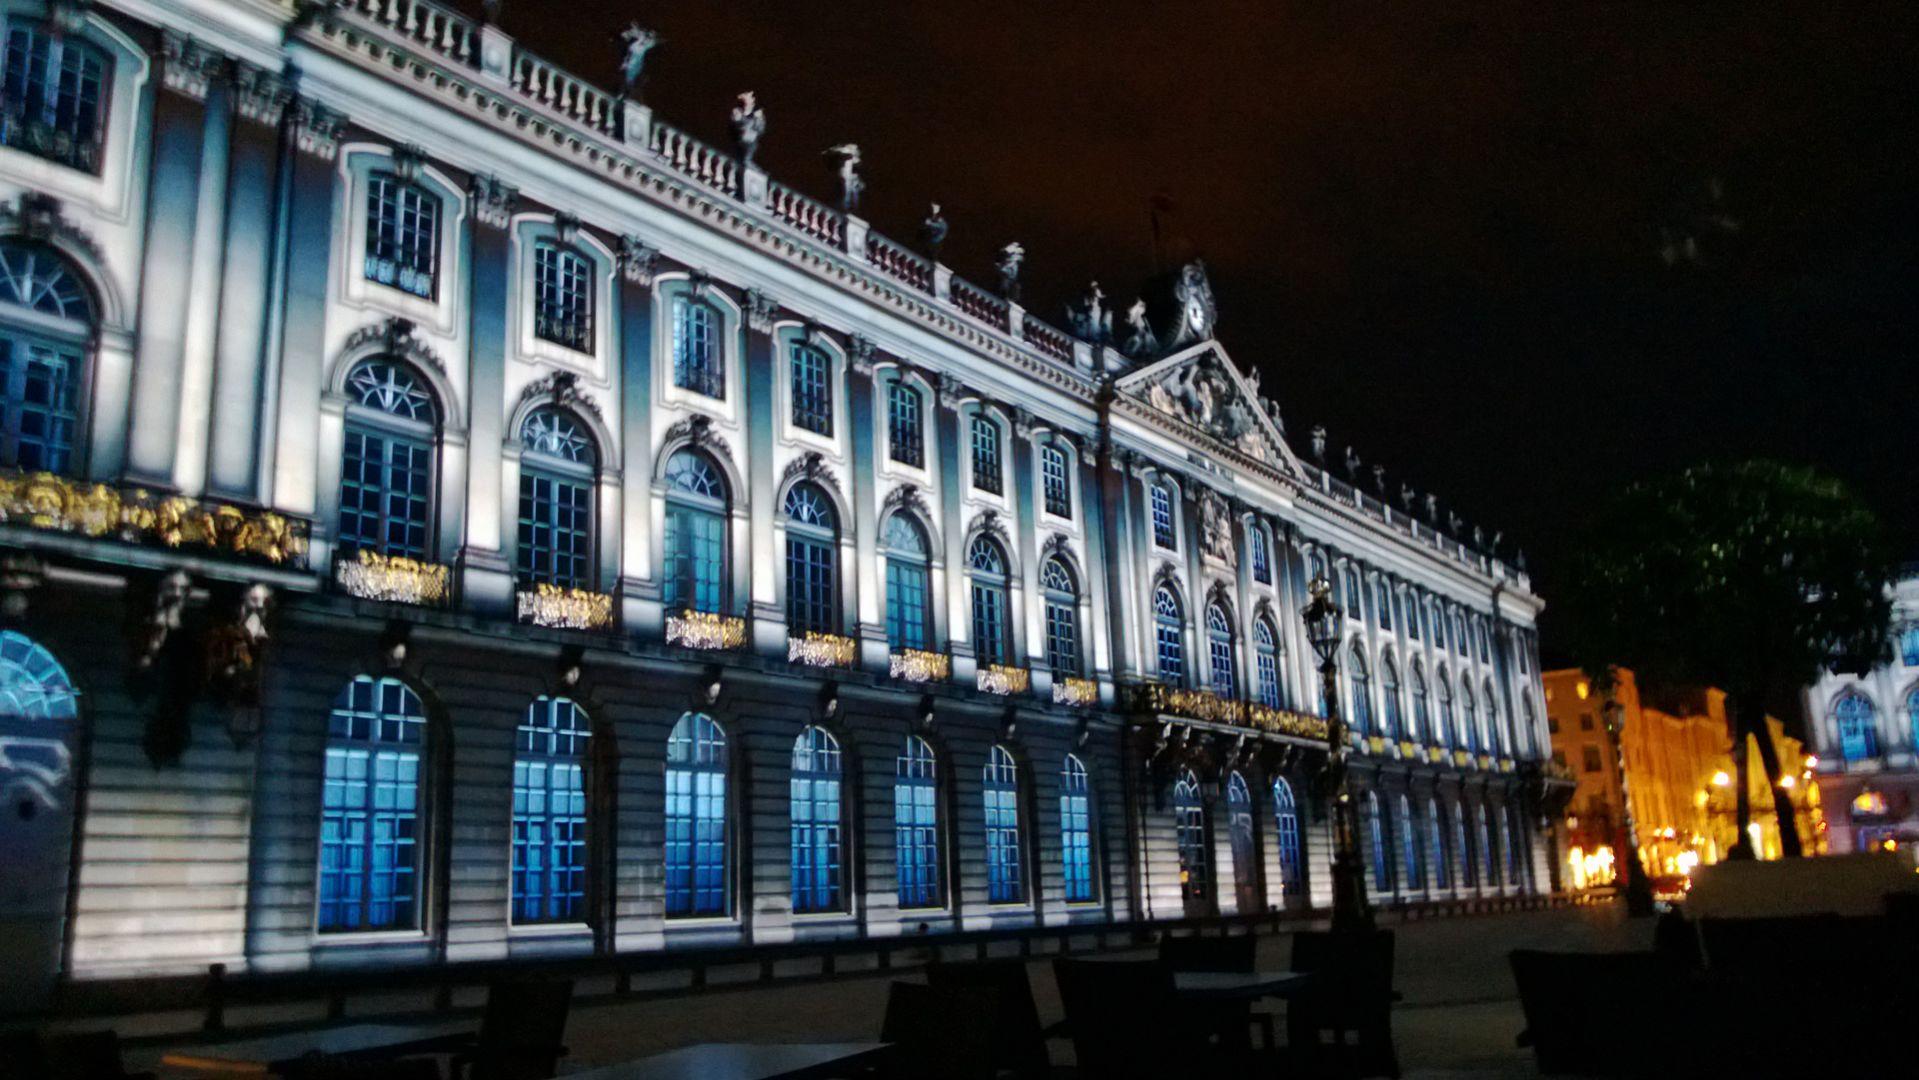 Place Stanislas de nuit - Lumia 920 - 5